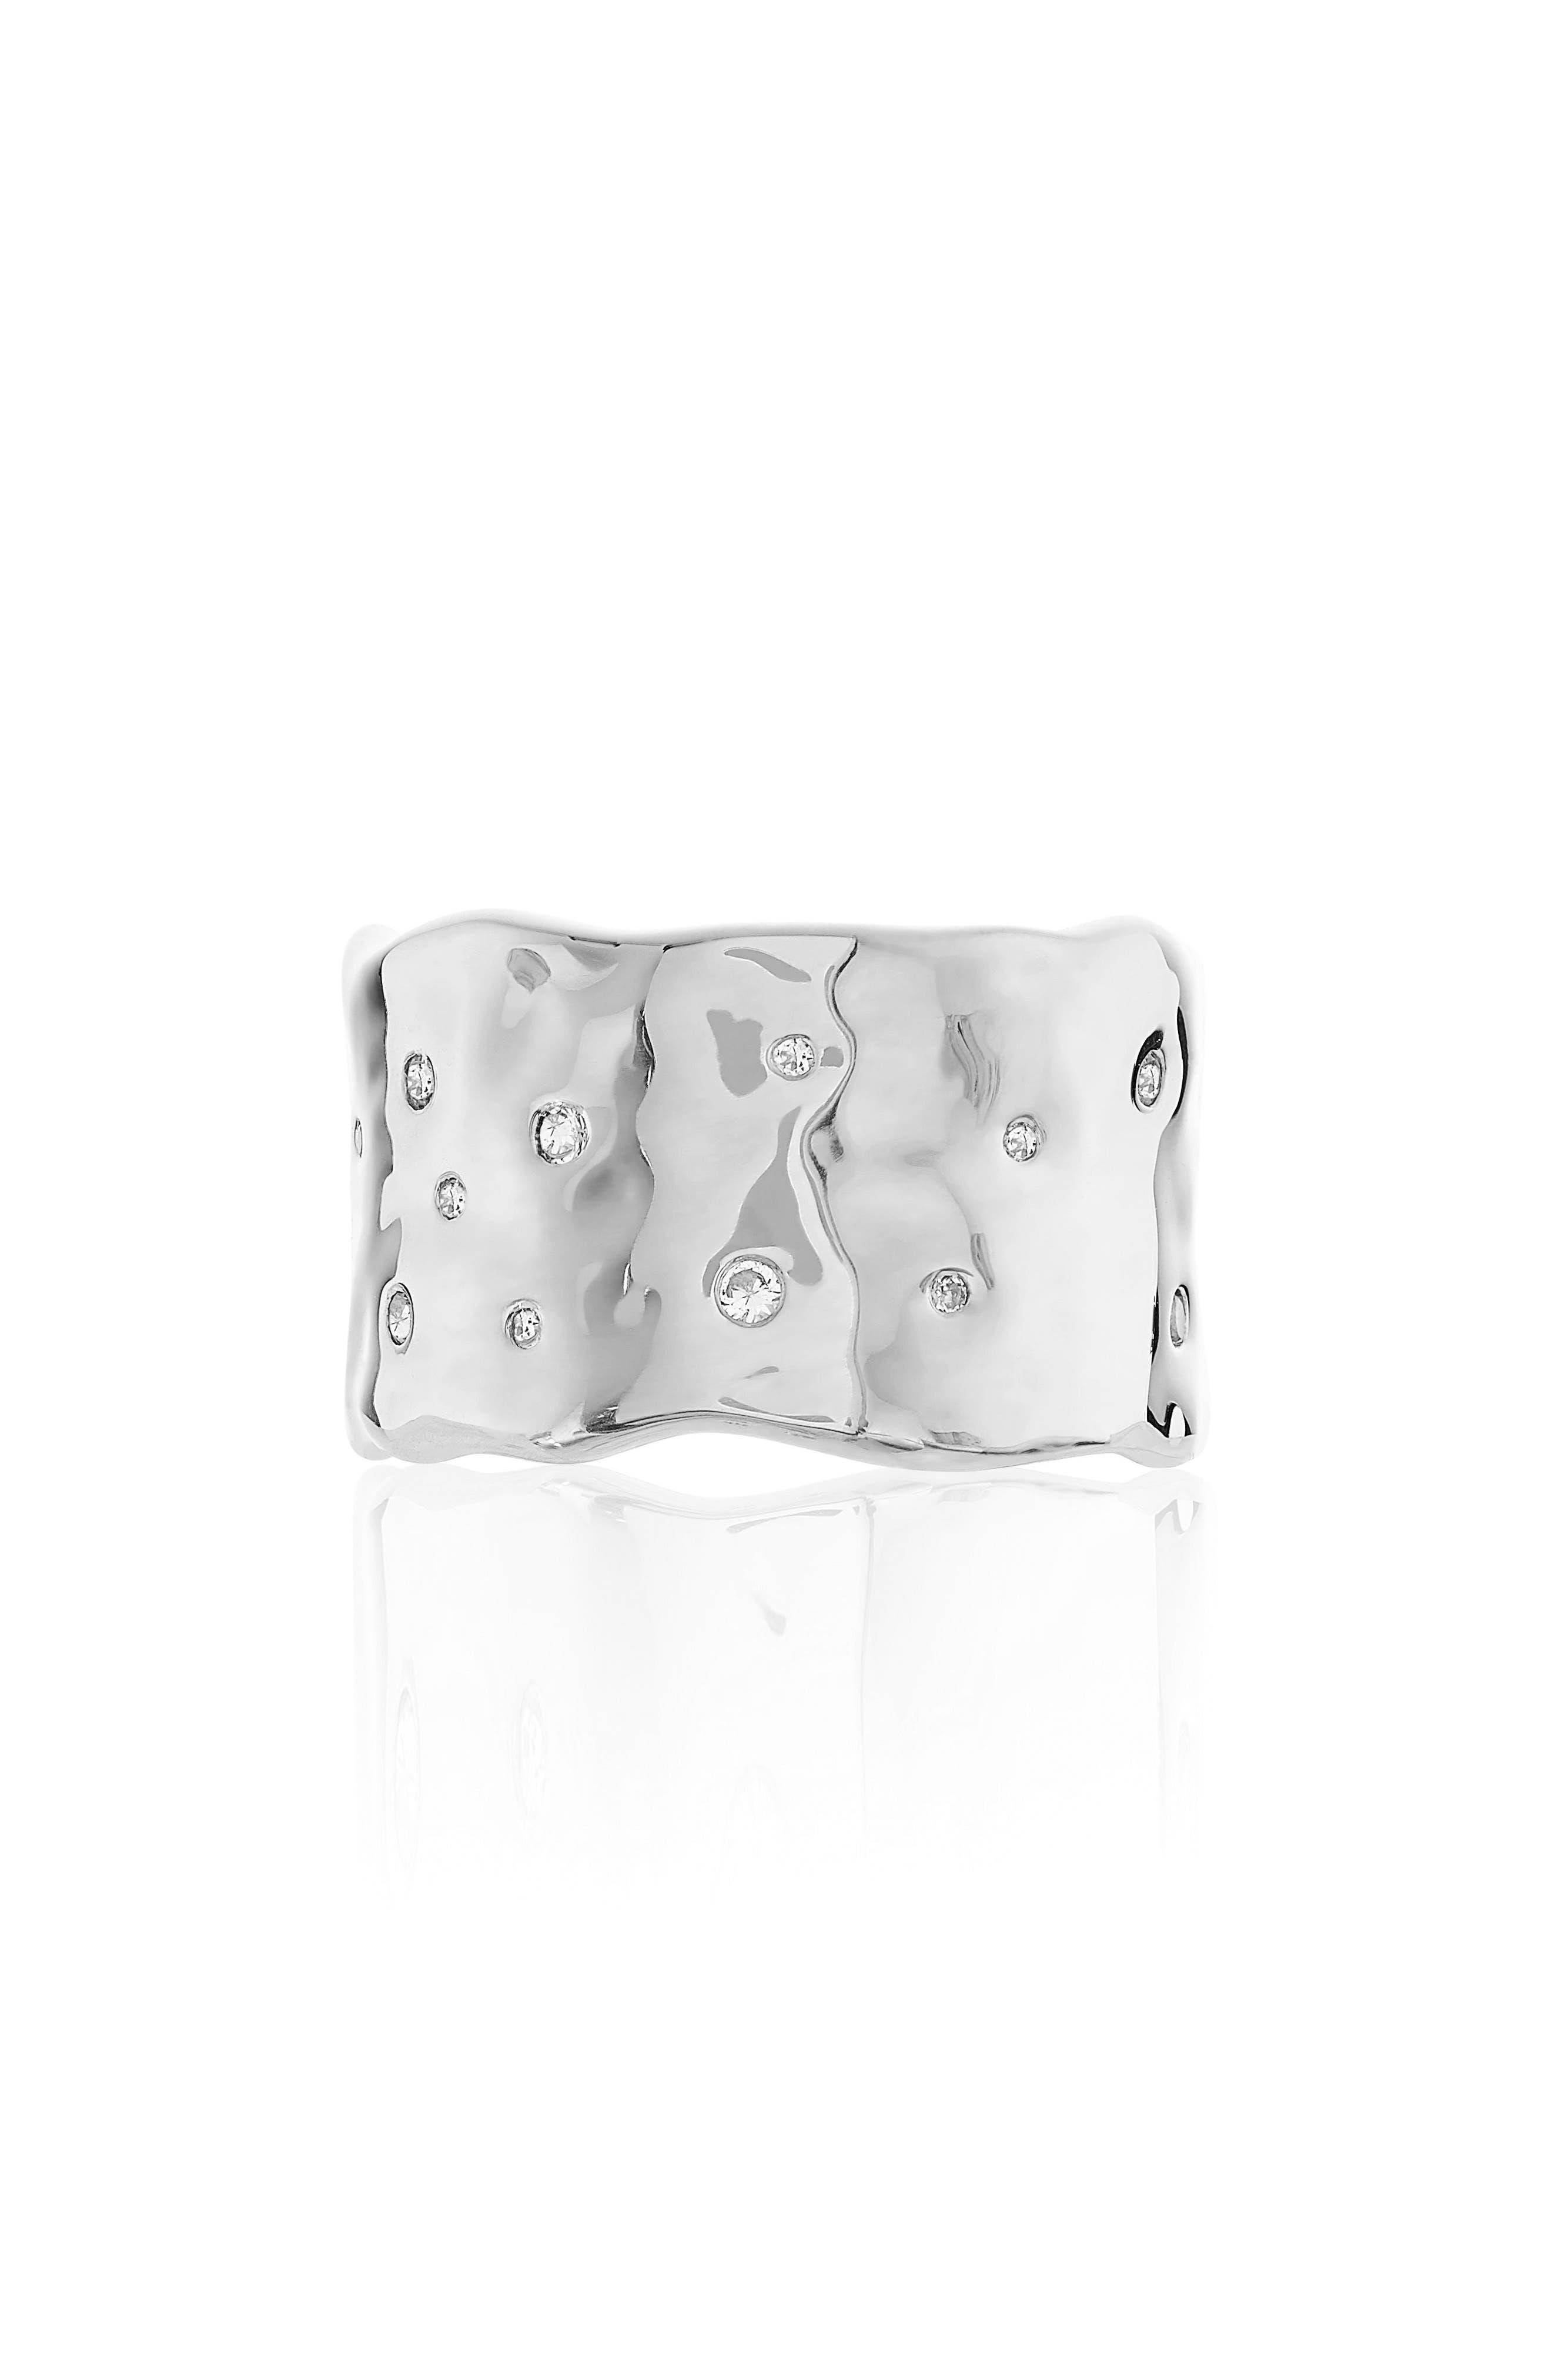 Siren Scatter Band Ring,                             Main thumbnail 1, color,                             Silver/ White Topaz